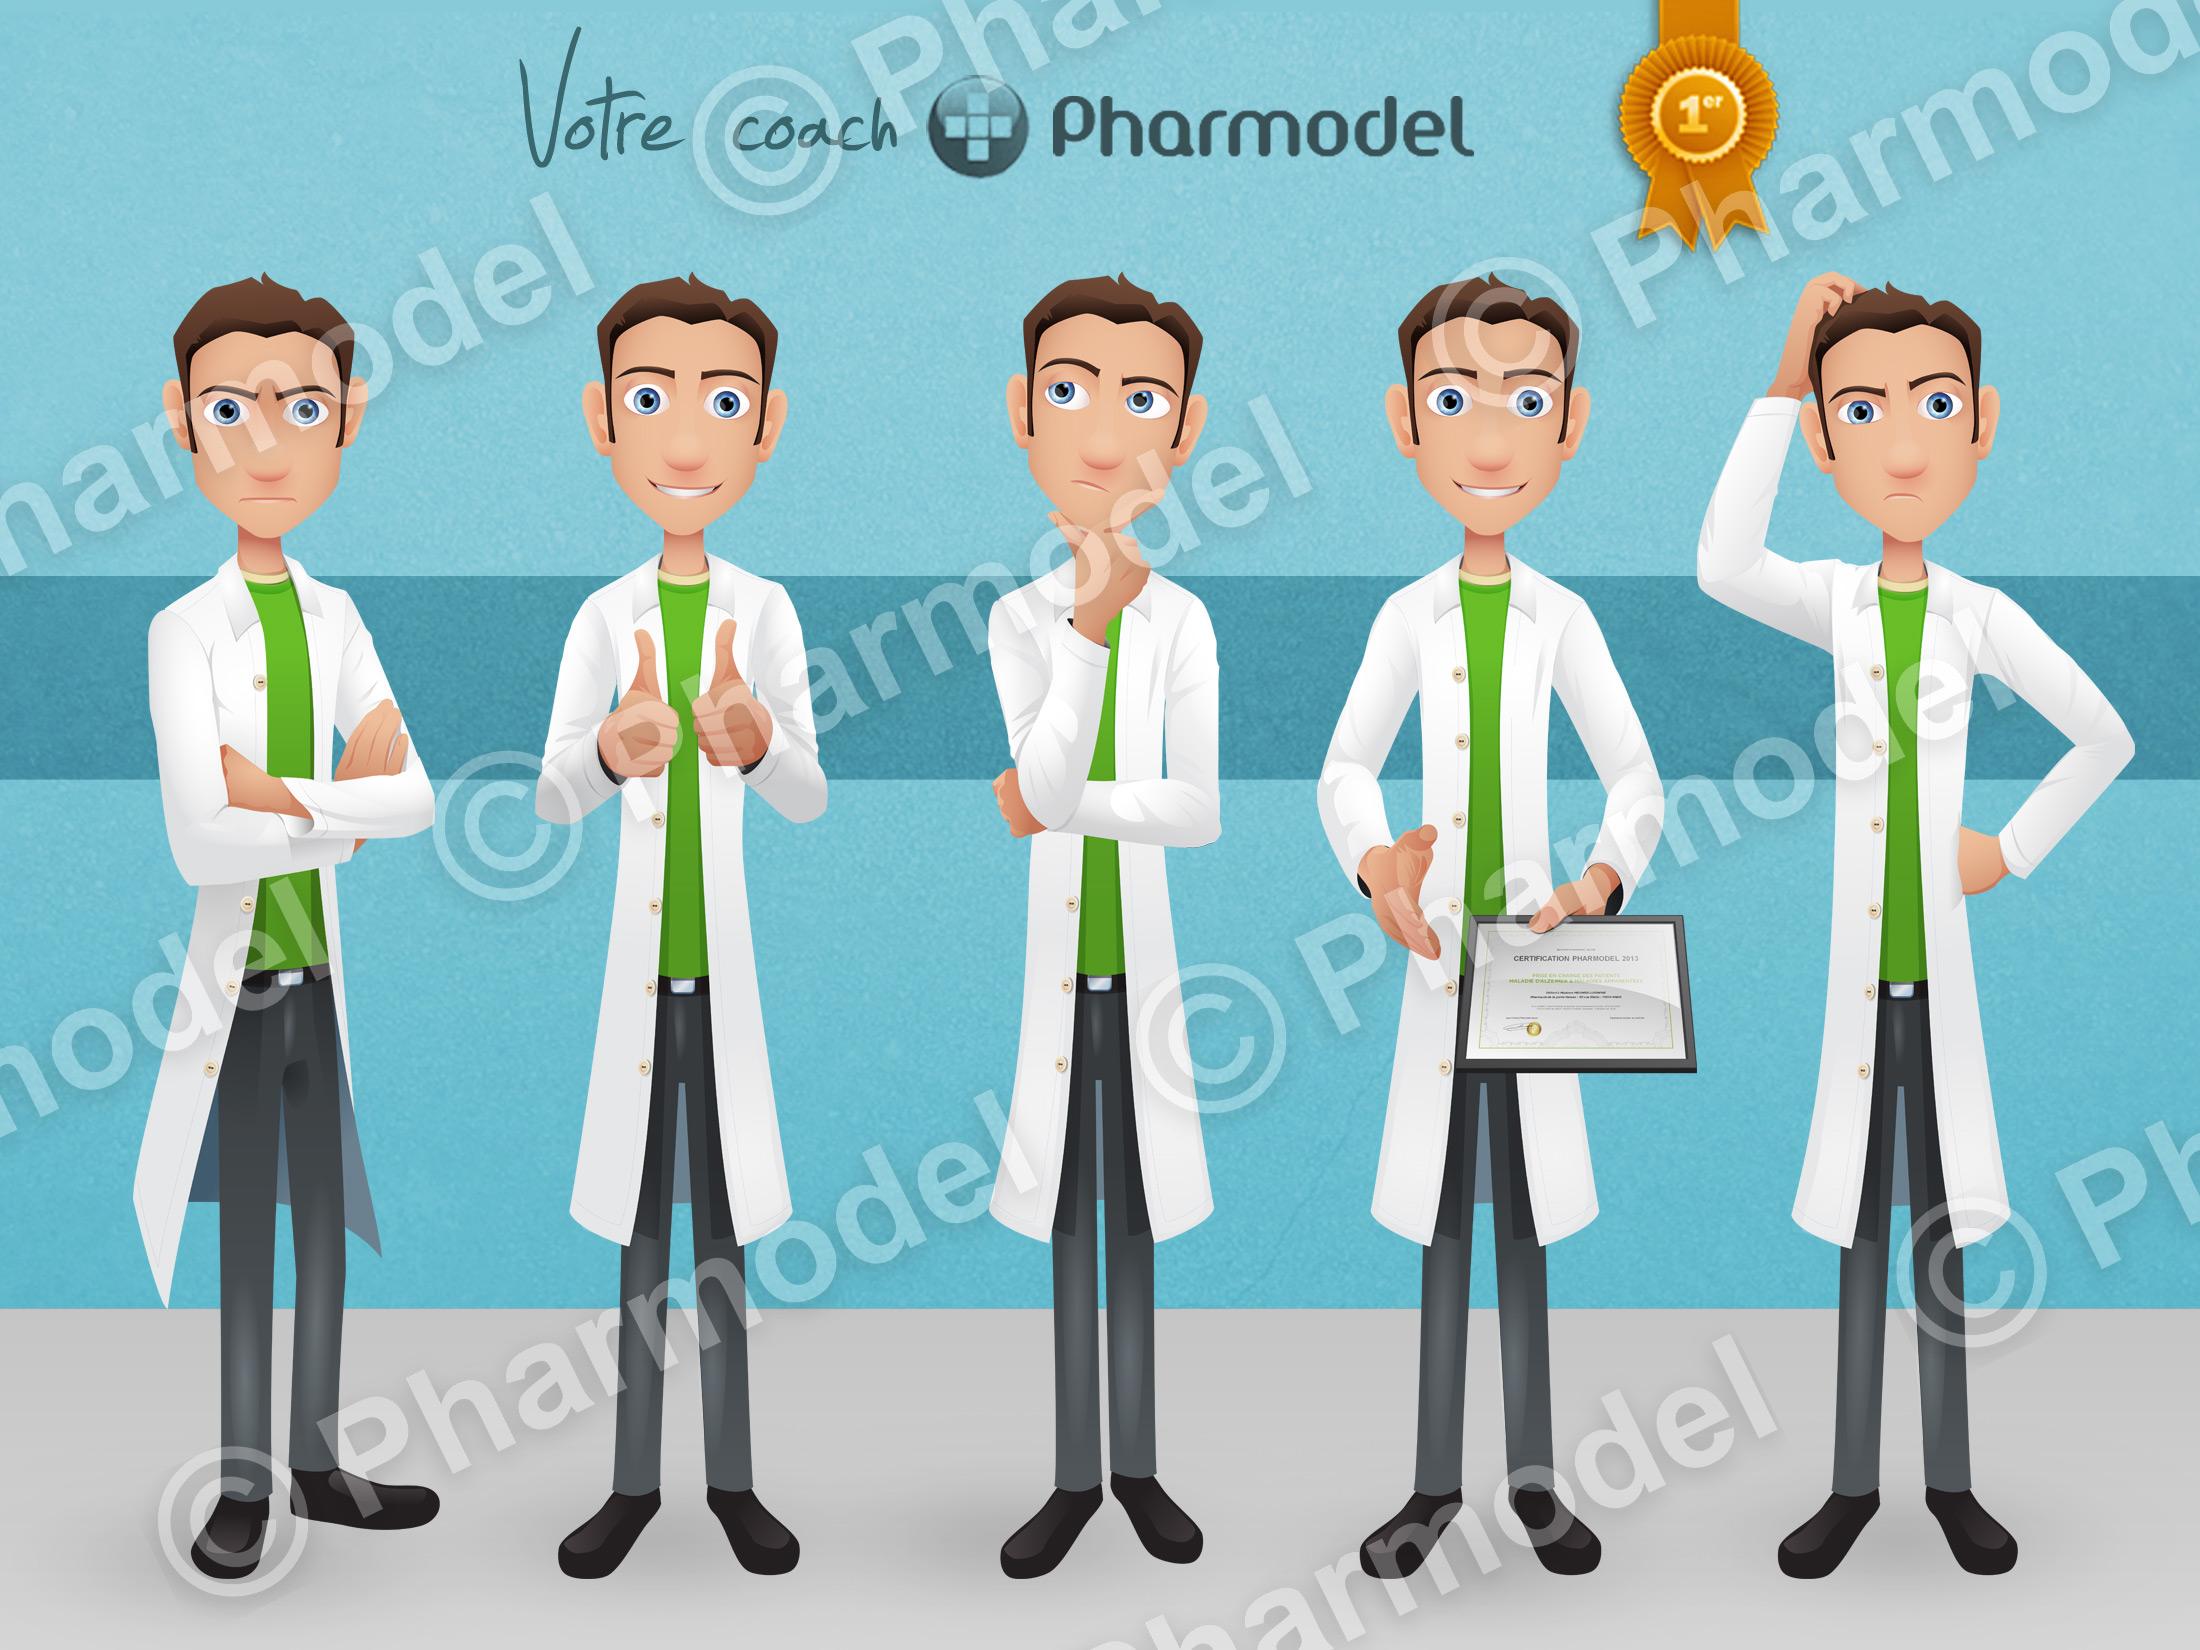 Coach Pharmodel